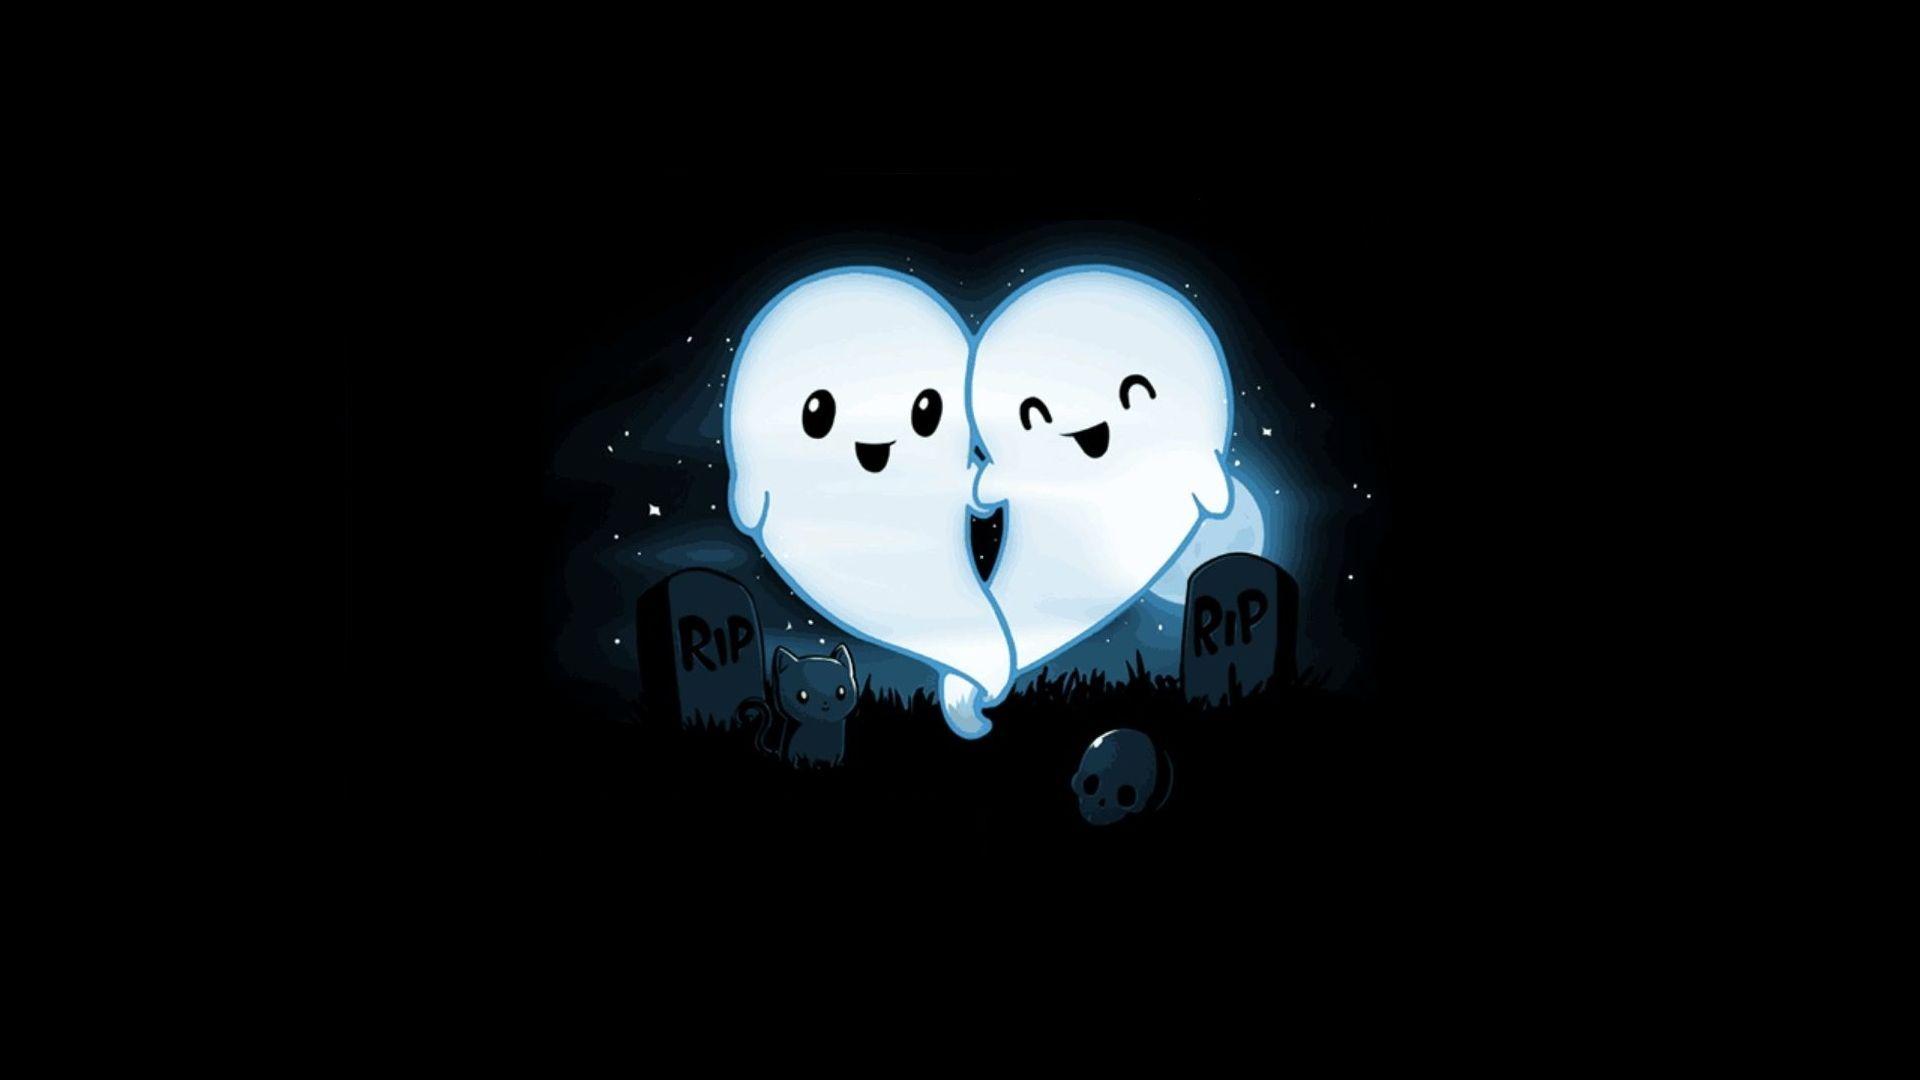 Graveyard Ghost Heart 1920x1080 R Wallpapers Cute Cartoon Wallpapers Teeturtle Cartoon Wallpaper